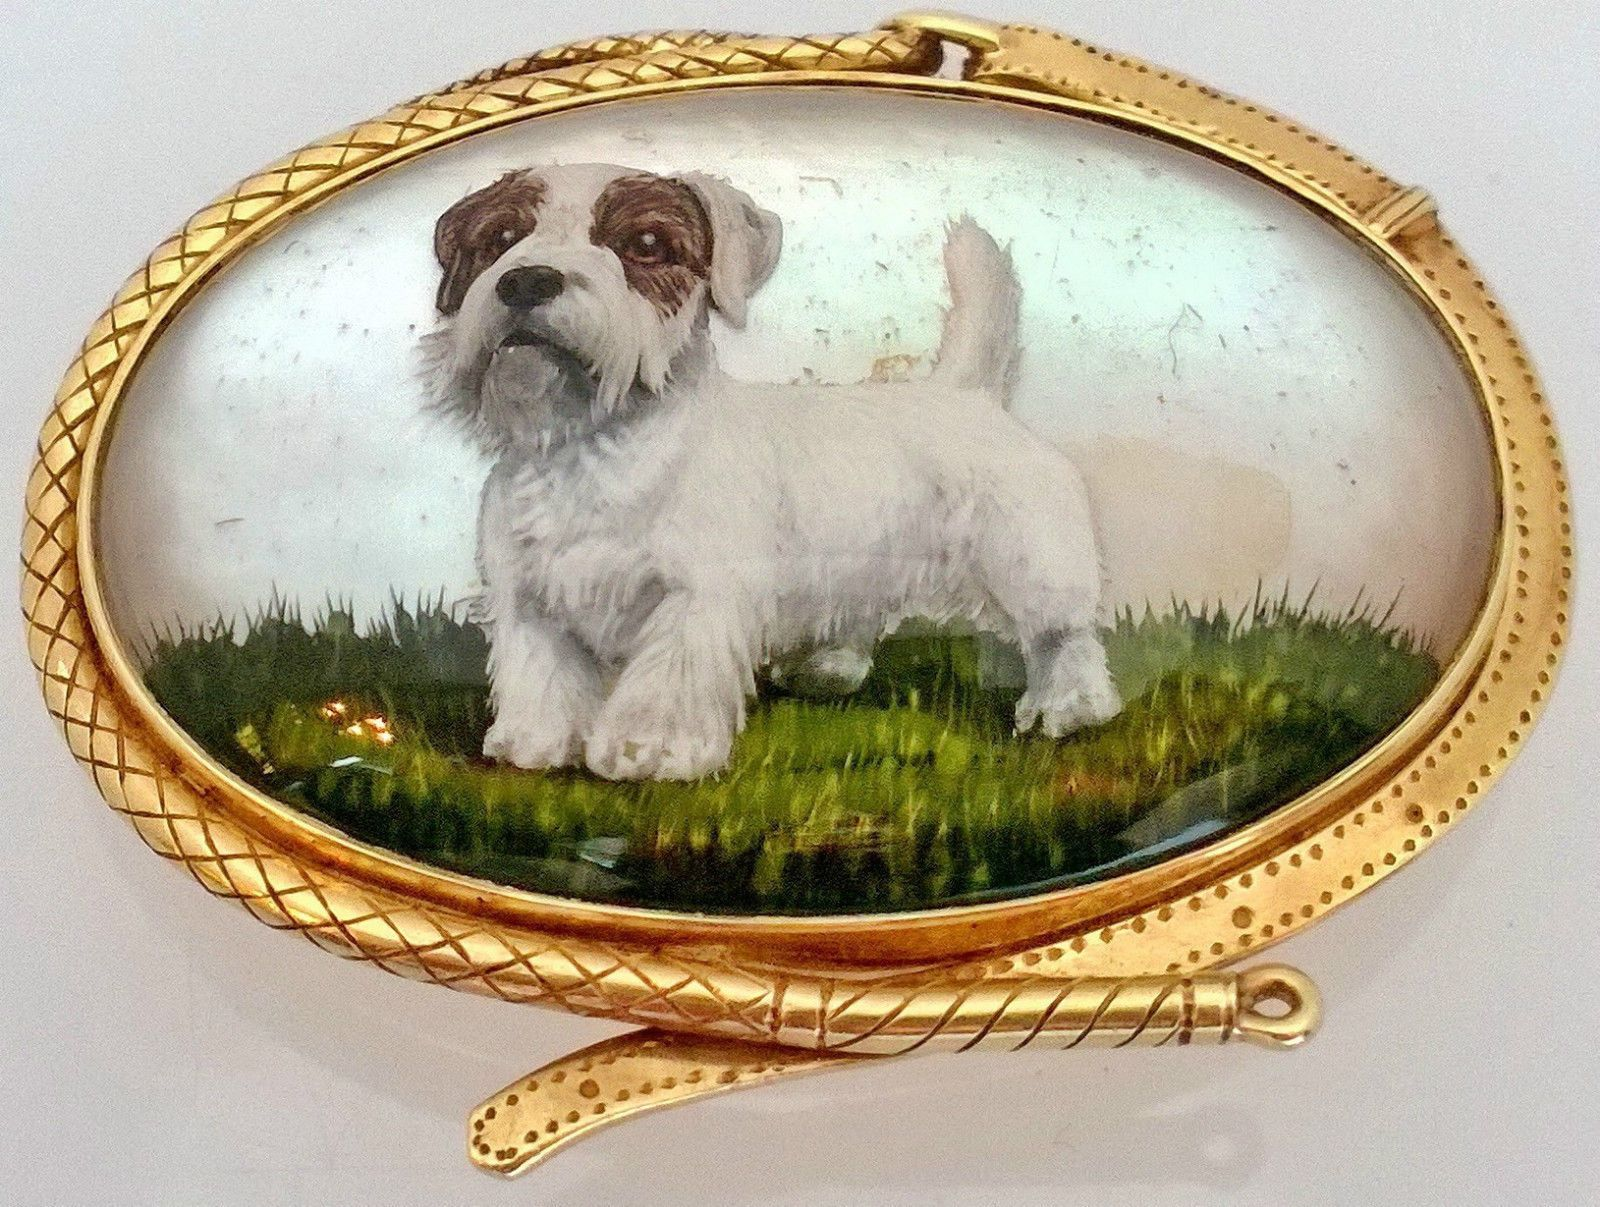 Stunning Victorian Oval Essex Crystal Terrier Dog 14k Solid Gold Brooch Pin   eBay